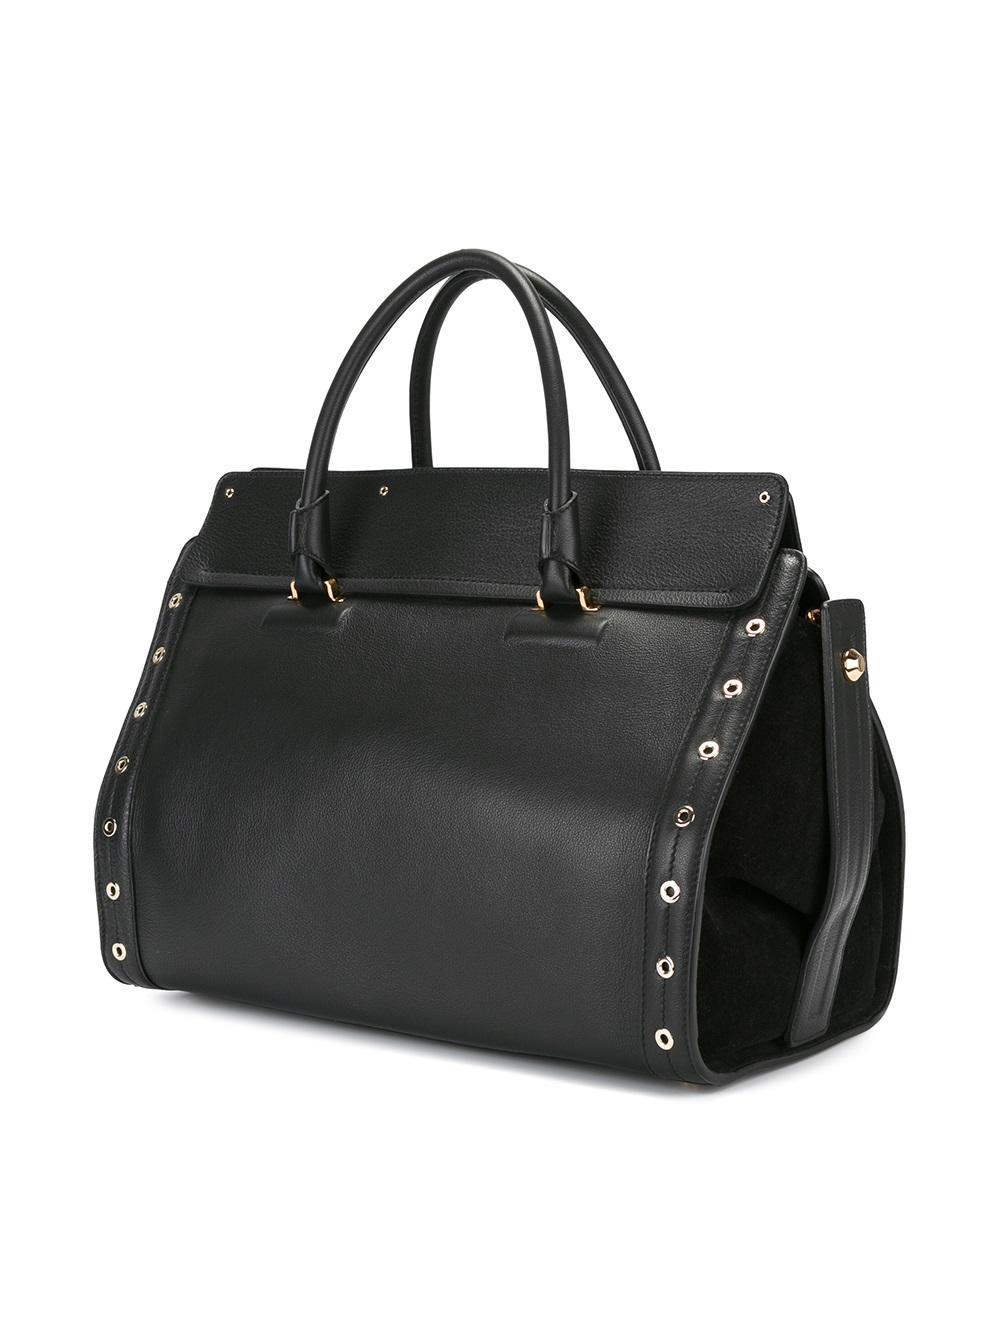 Furla Valentina Tote Bag In Black Lyst